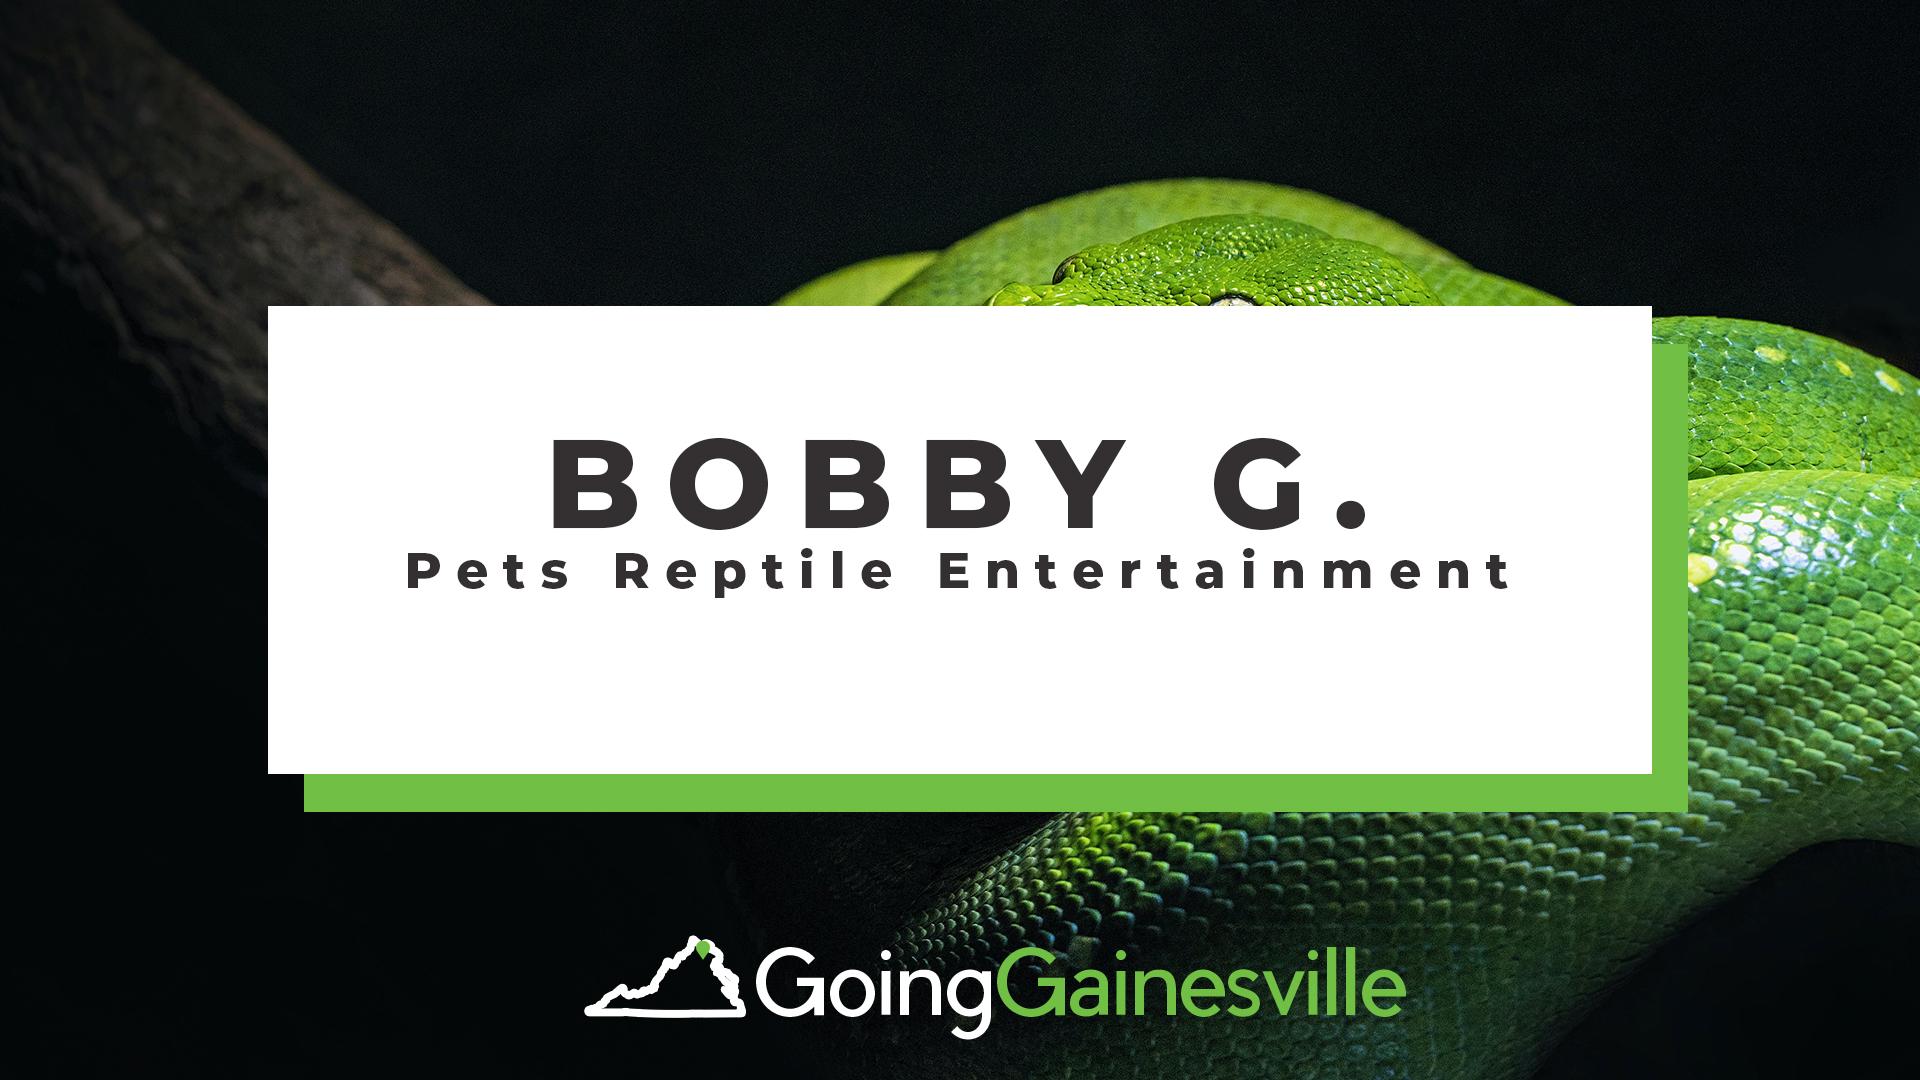 Bobby G. Pet's